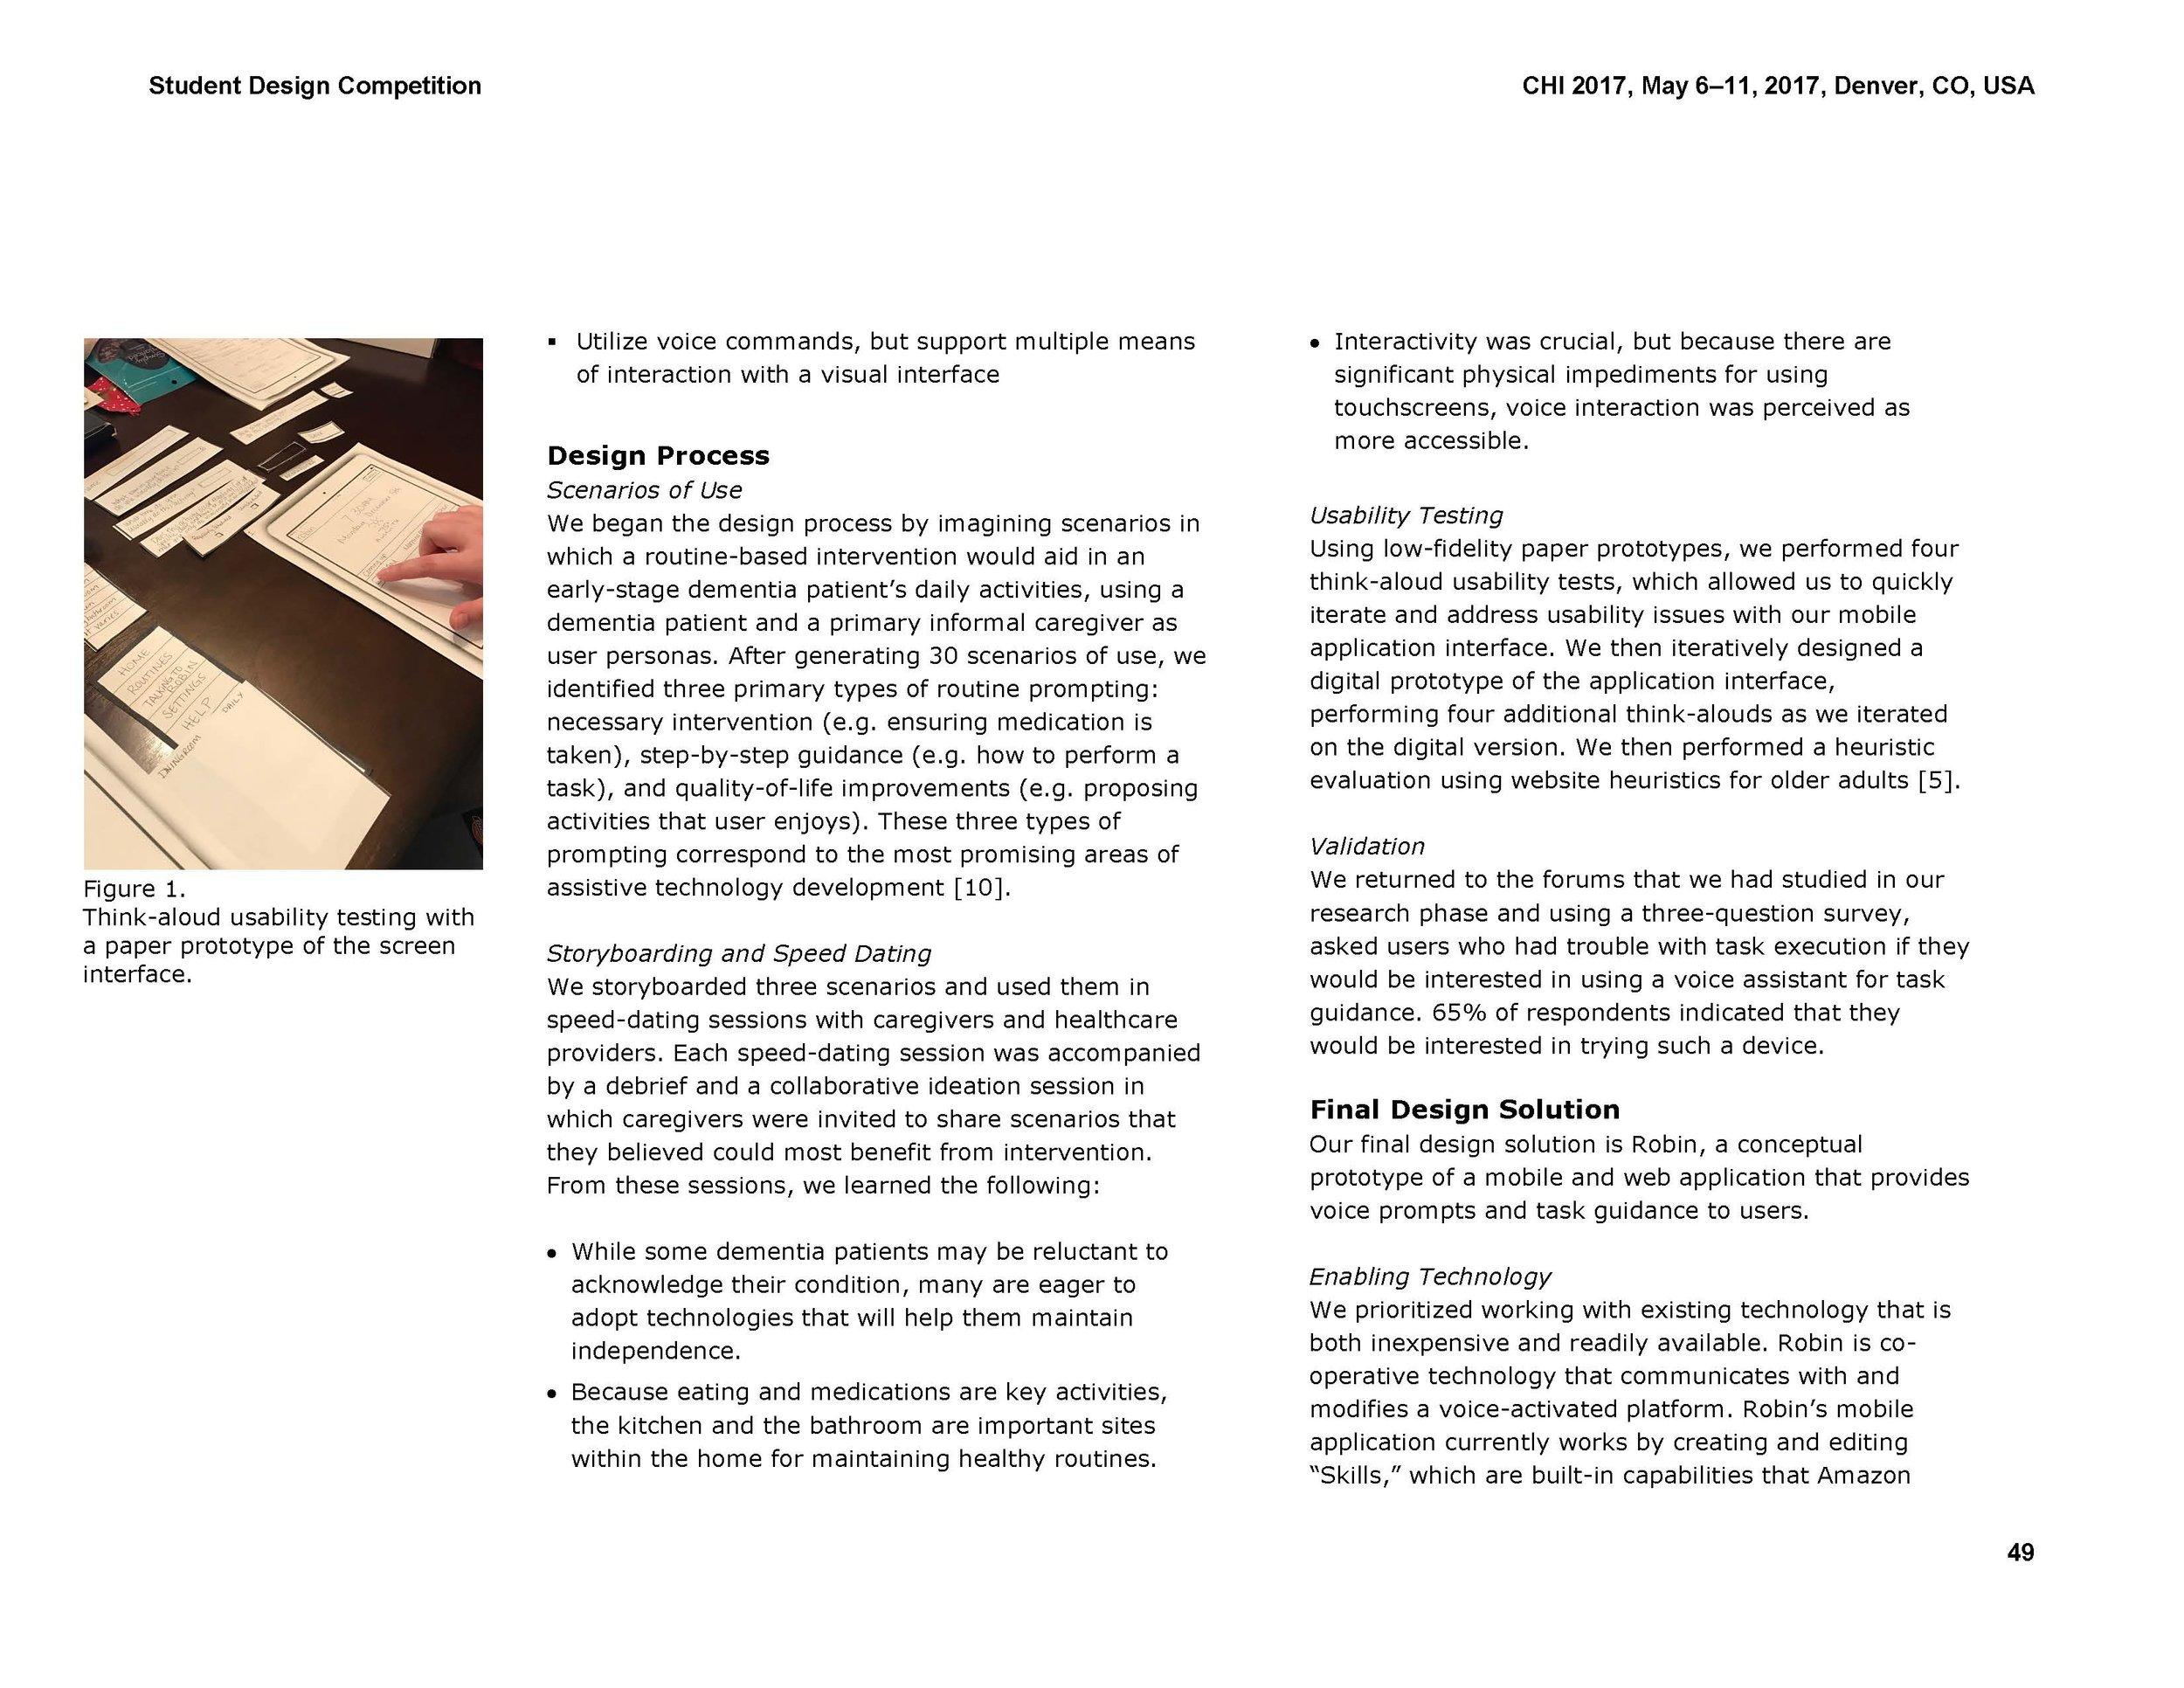 Robin paper final_Page_4.jpg